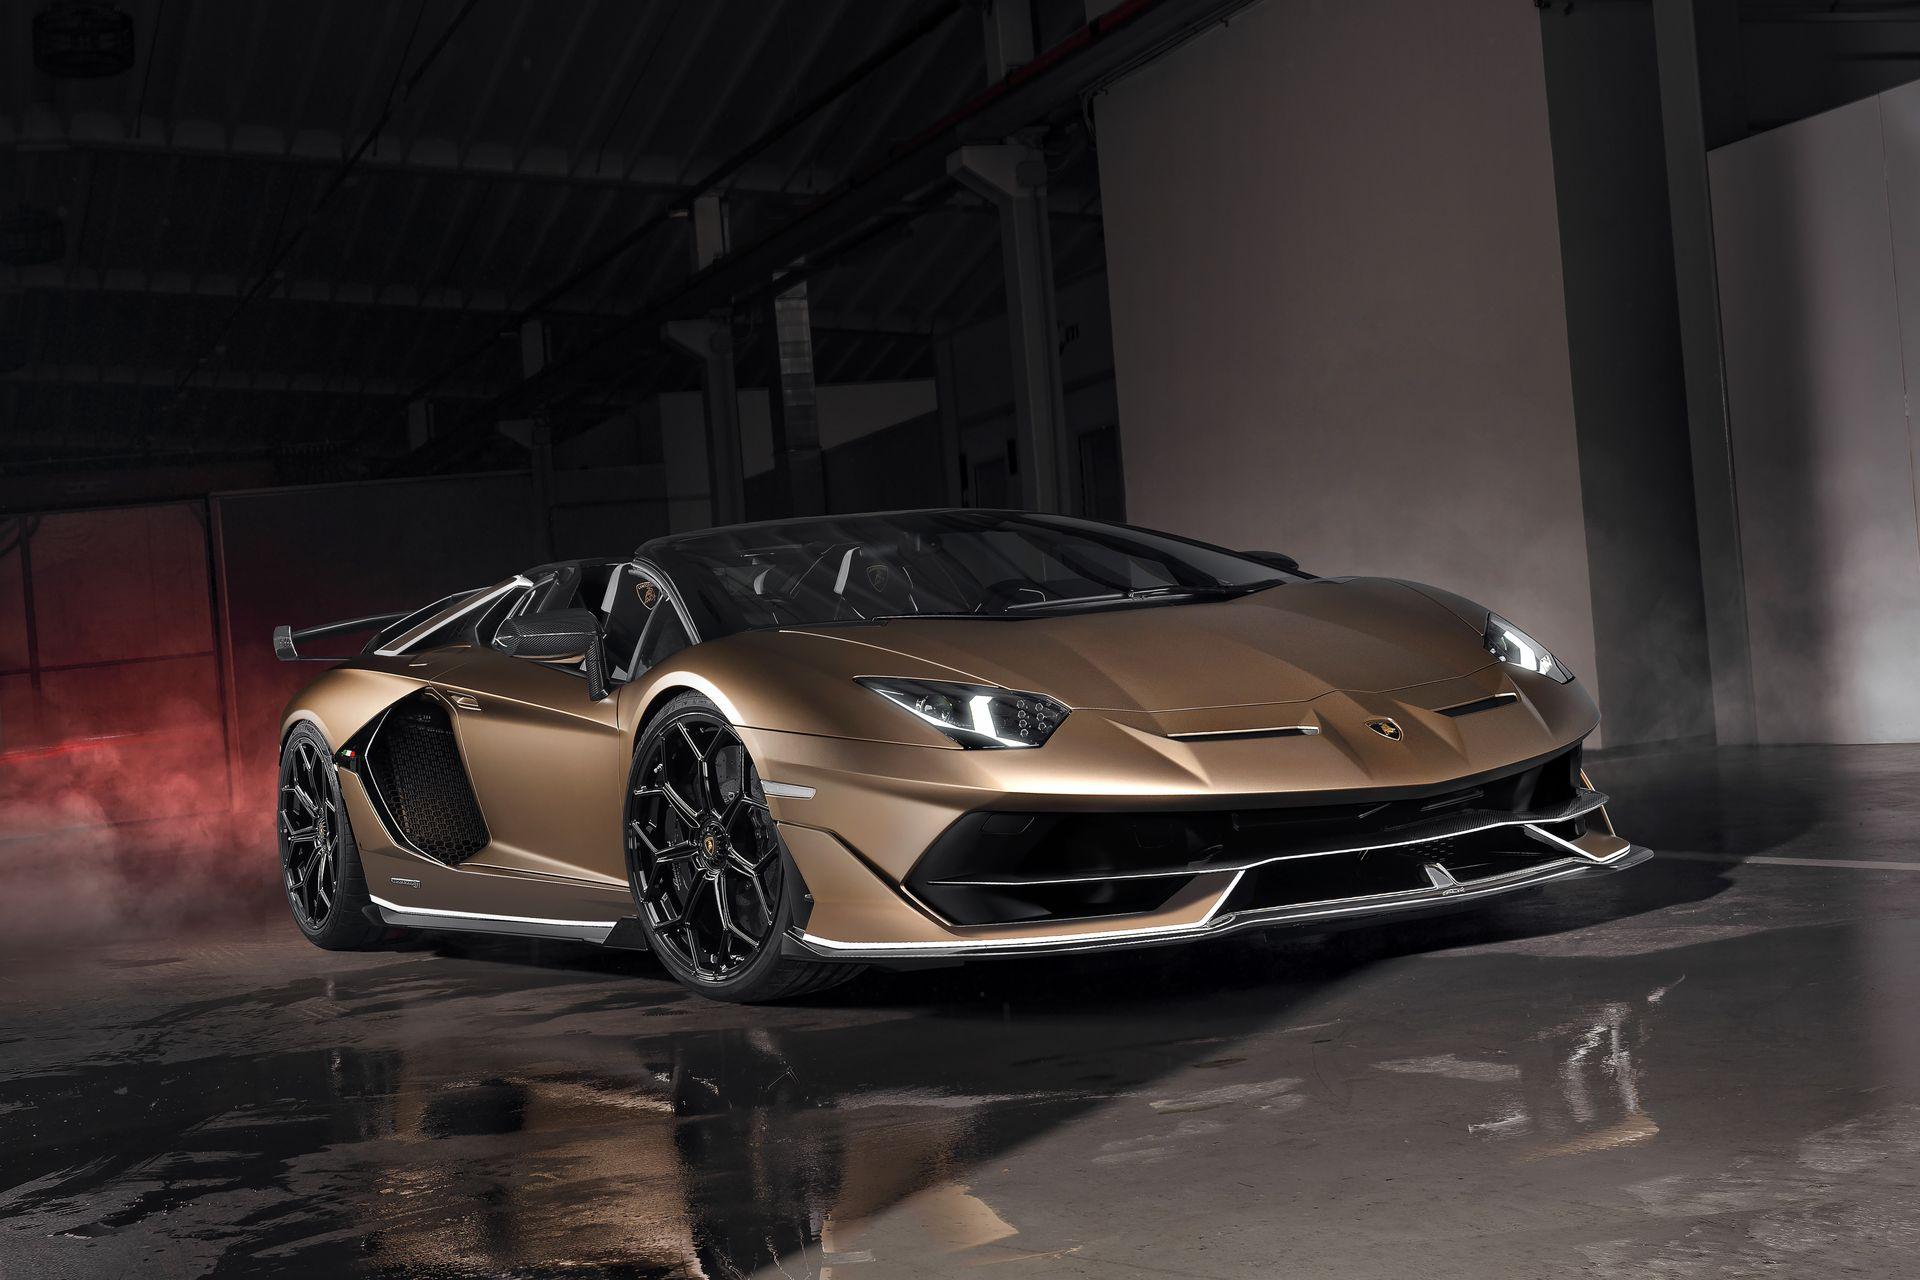 Lamborghini Aventador Svj Roadster 1